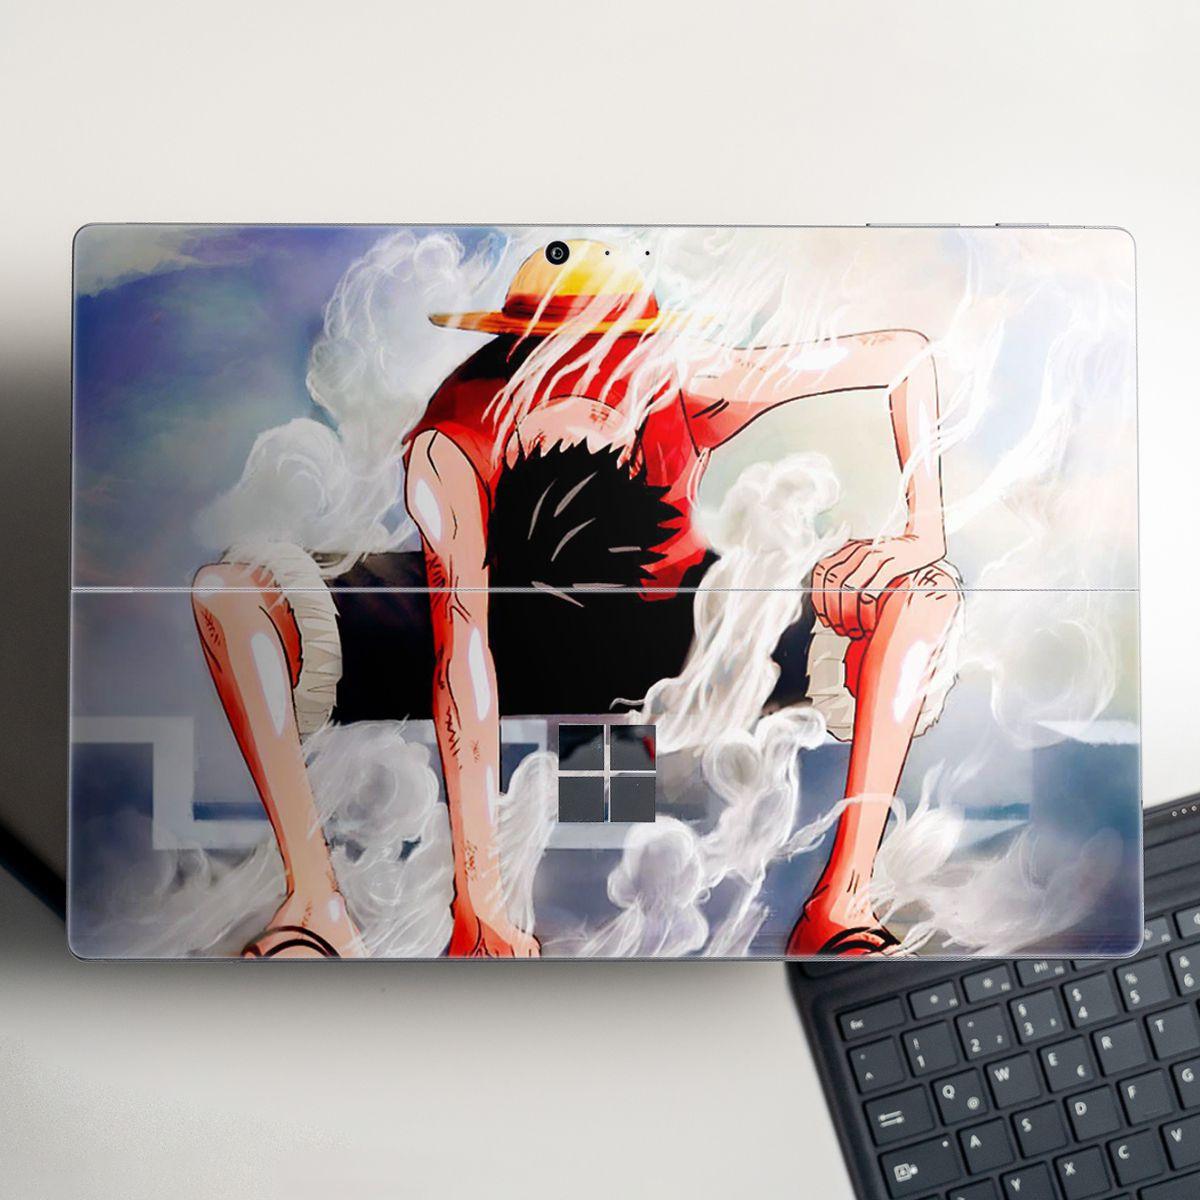 Skin dán hình One Piece x13 cho Surface Go, Pro 2, Pro 3, Pro 4, Pro 5, Pro 6, Pro 7, Pro X